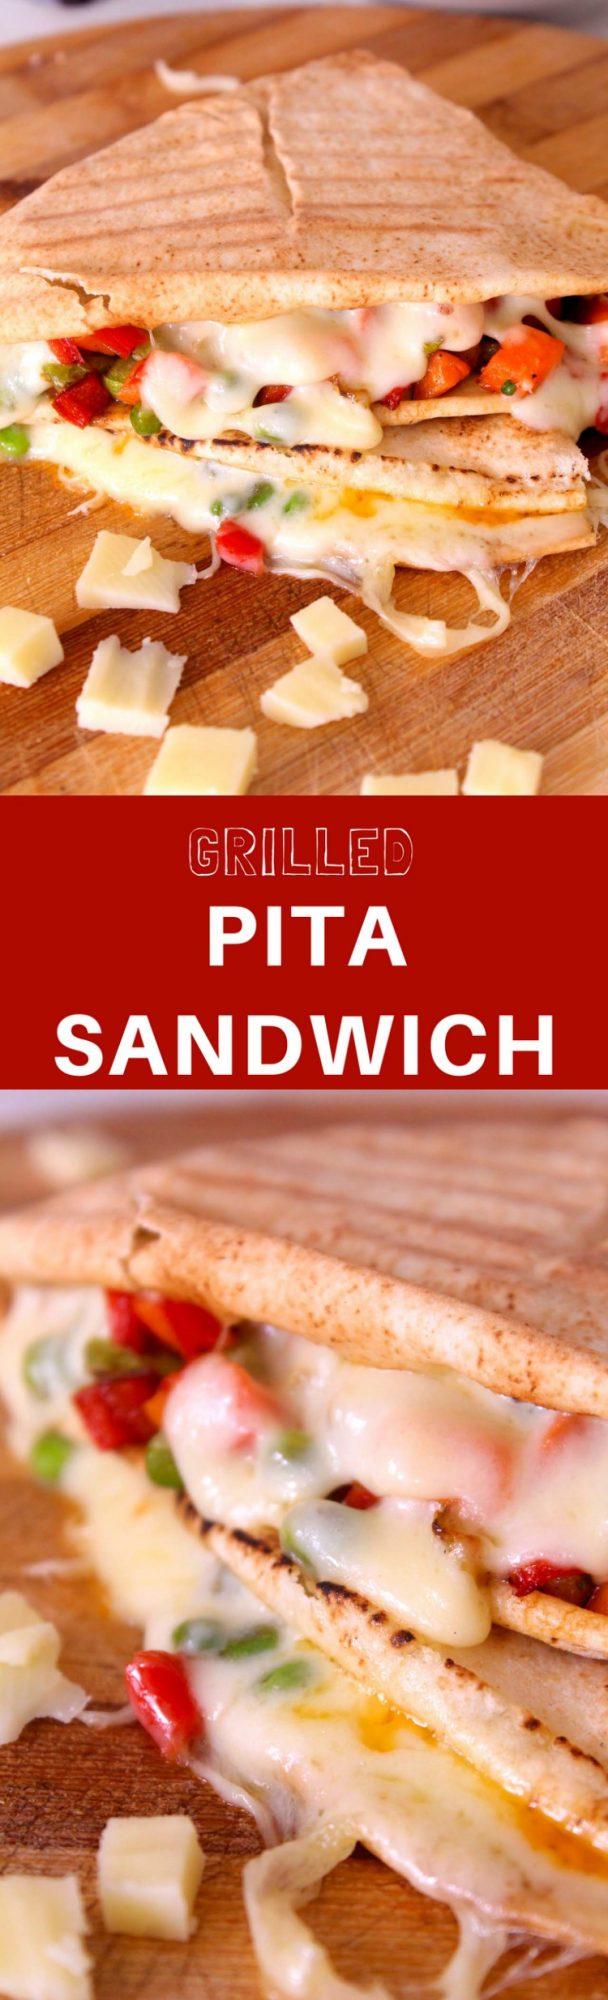 Pita sandwich recipe